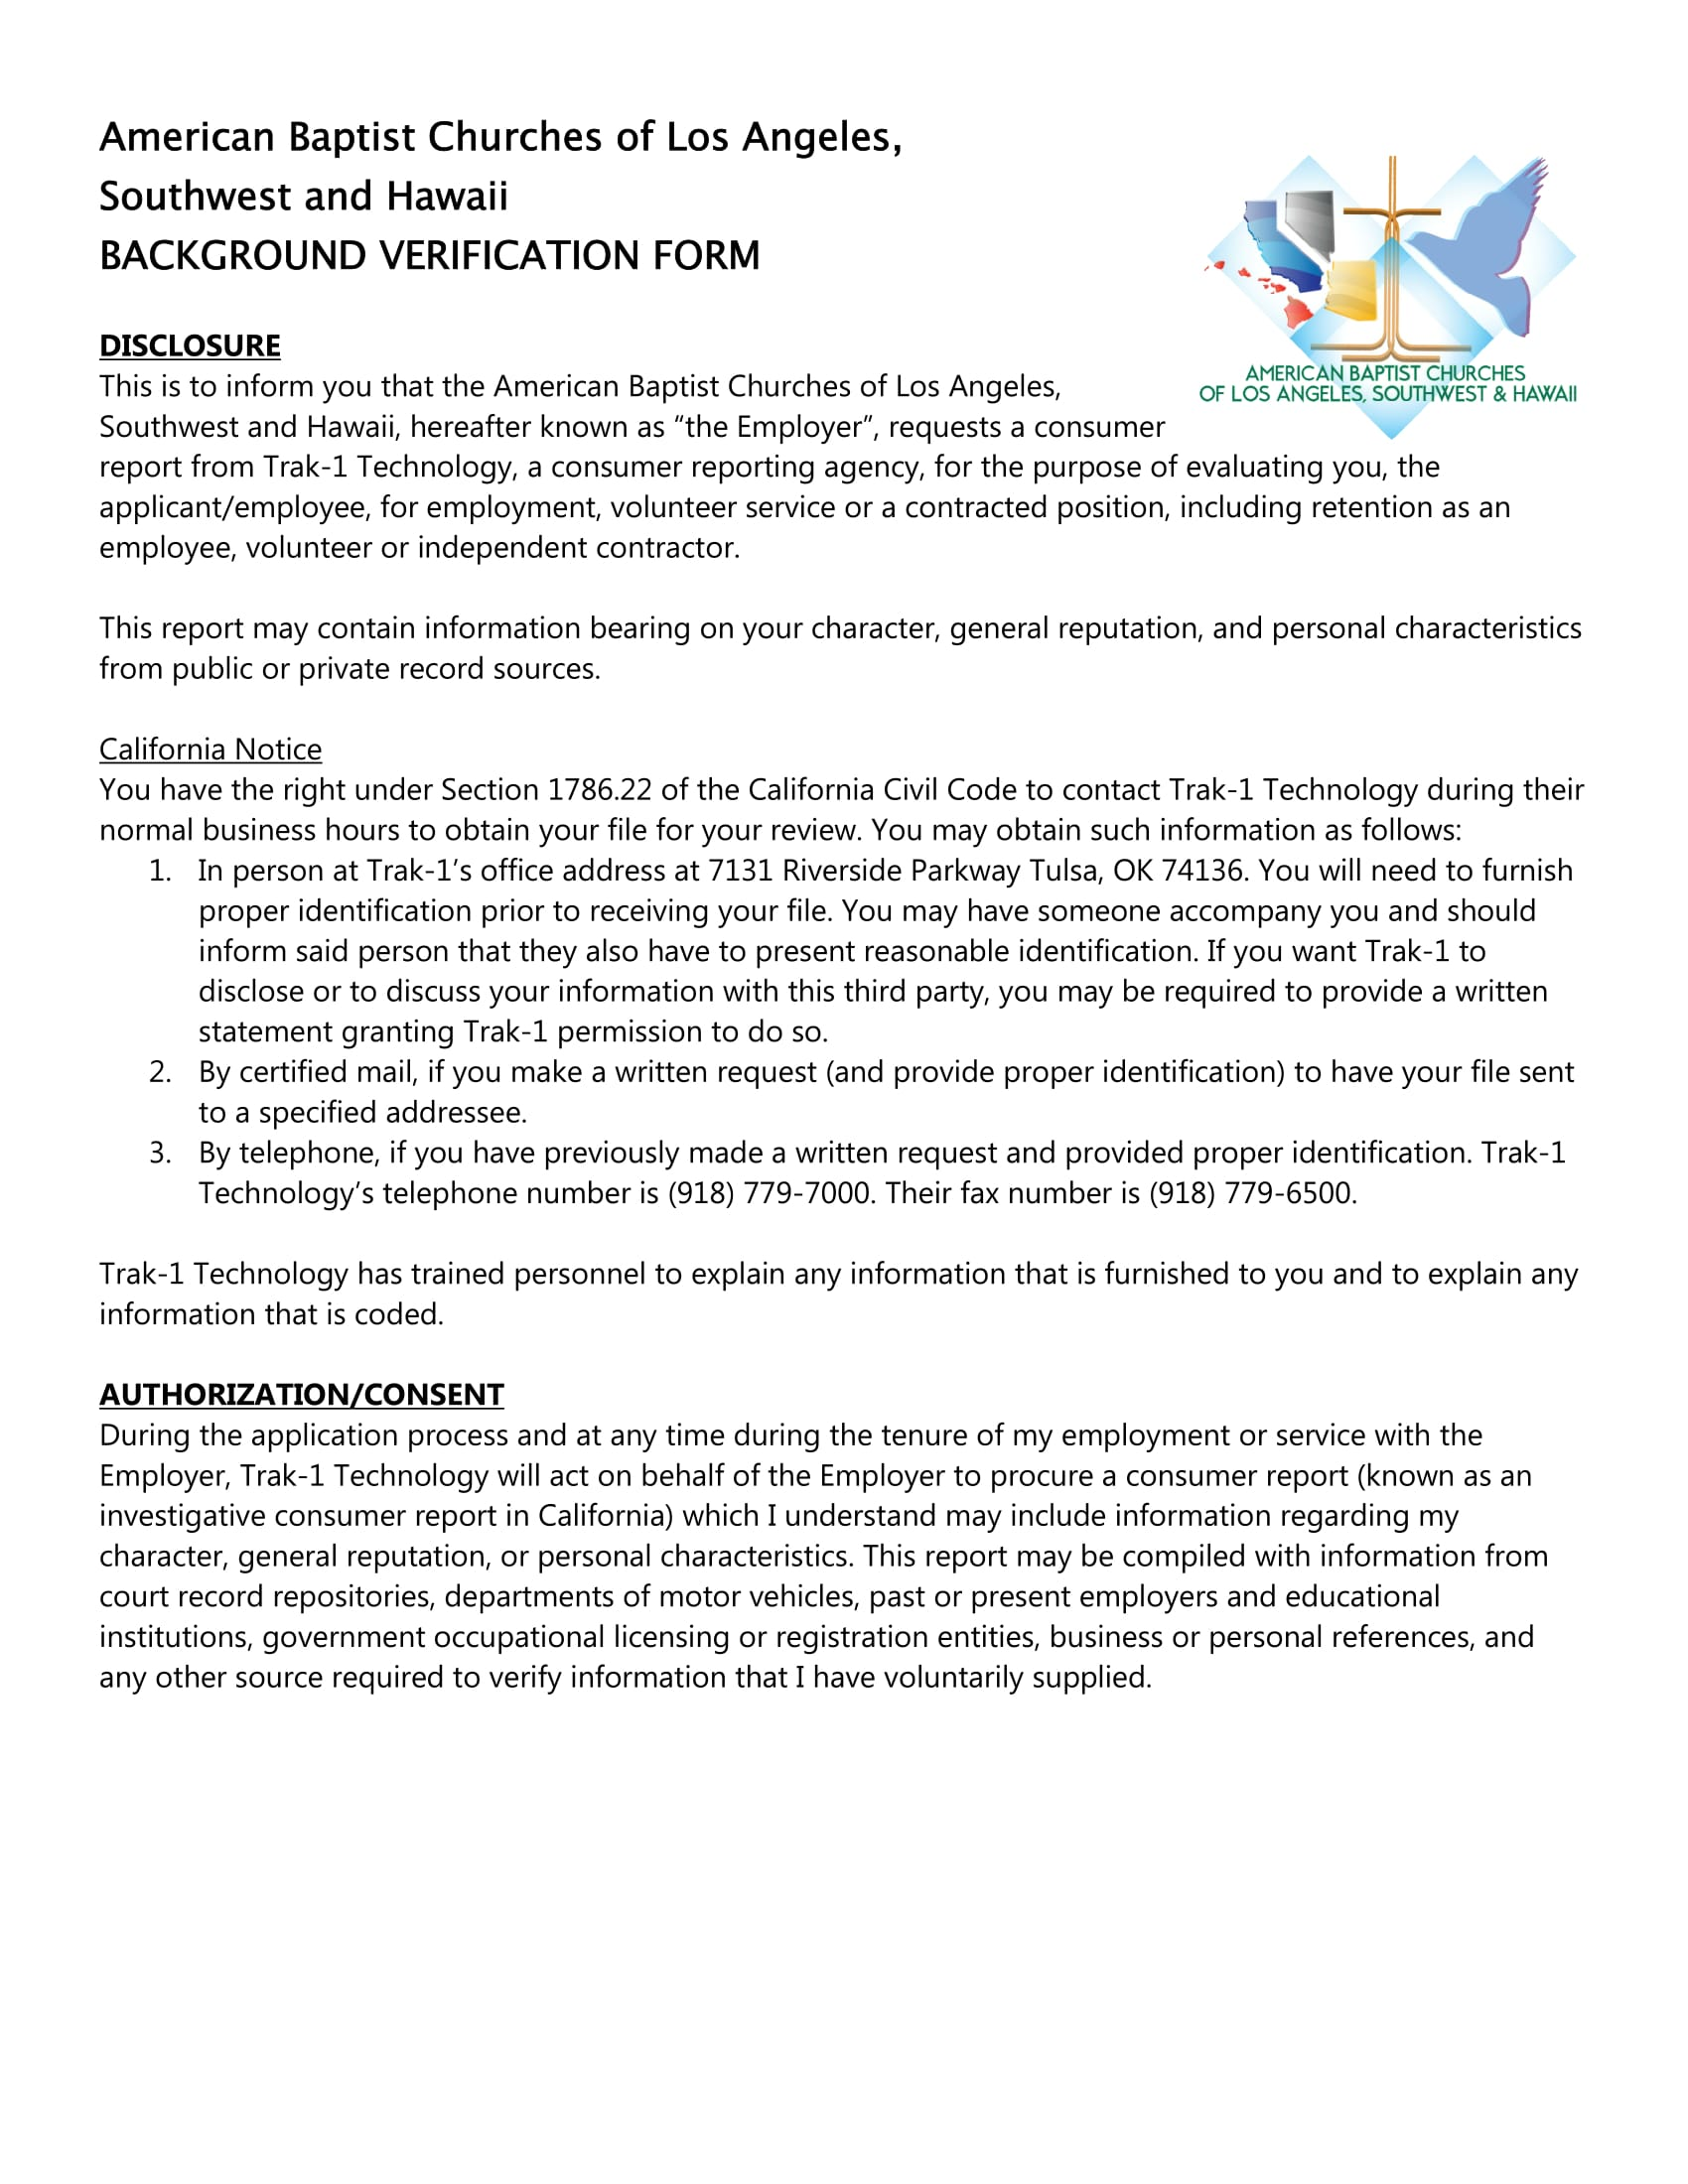 employment background verification form 1